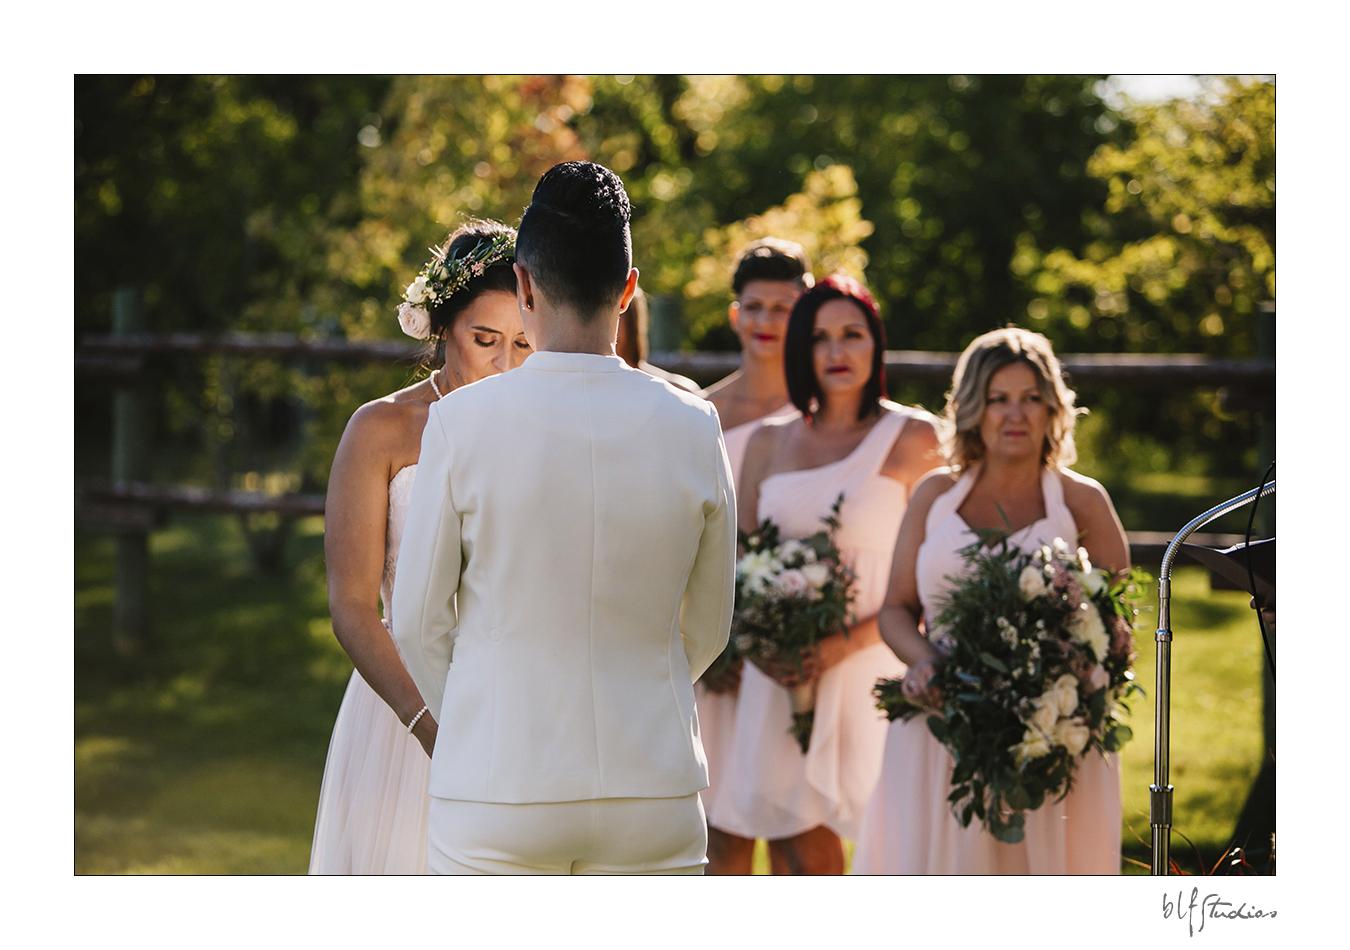 029-winnipeg-hitchnpost-wedding-marla-alana.jpg